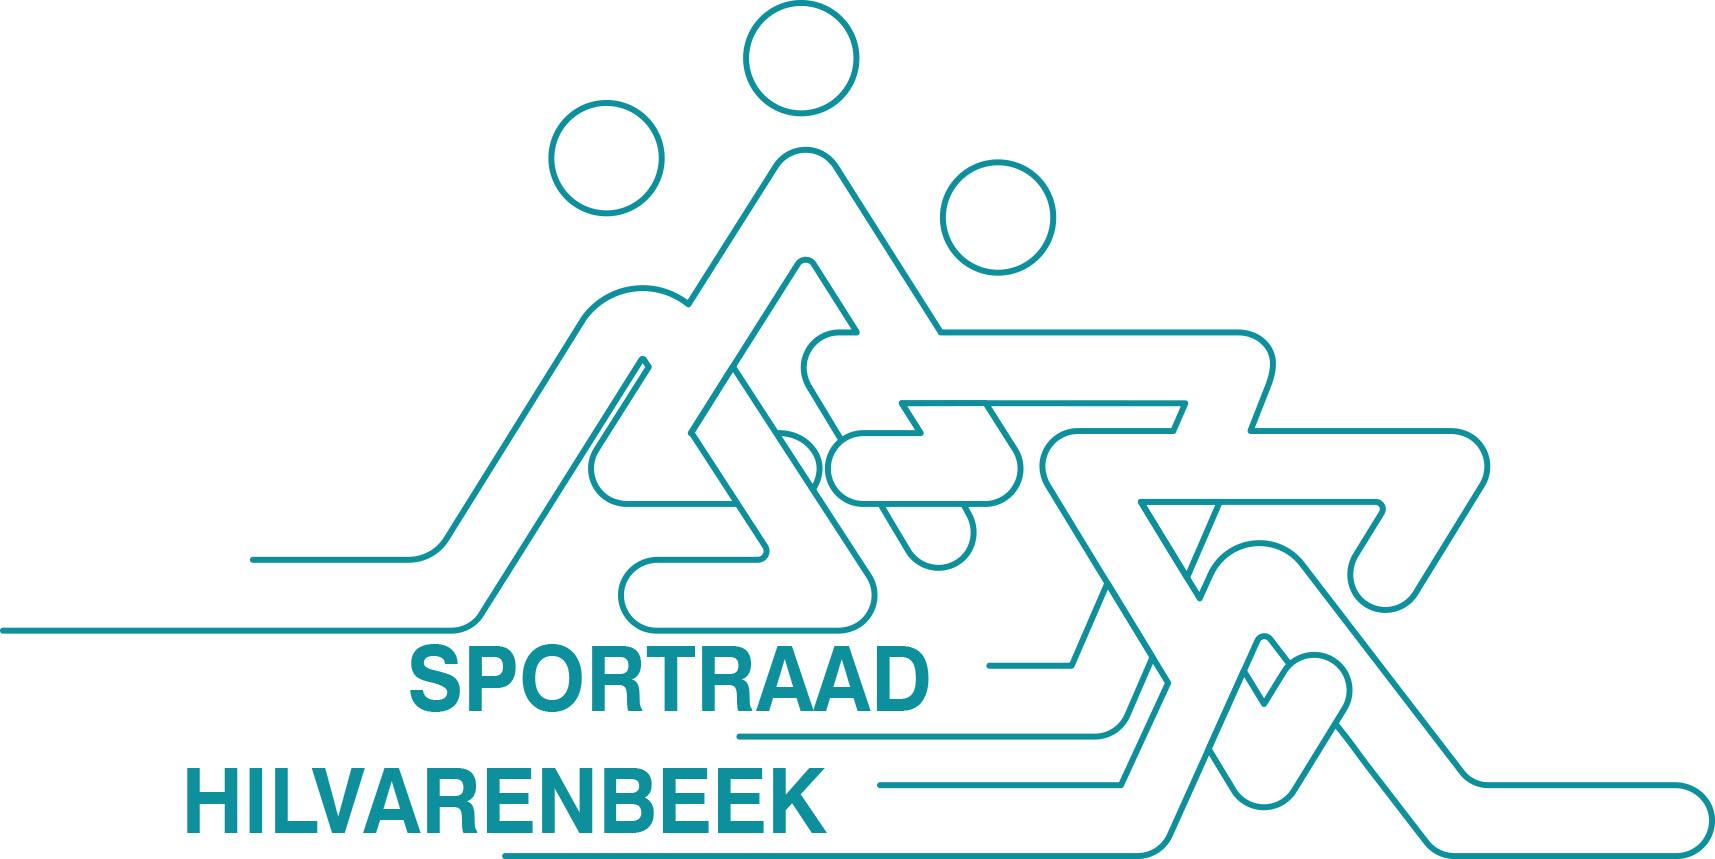 Sportraad Hilvarenbeek